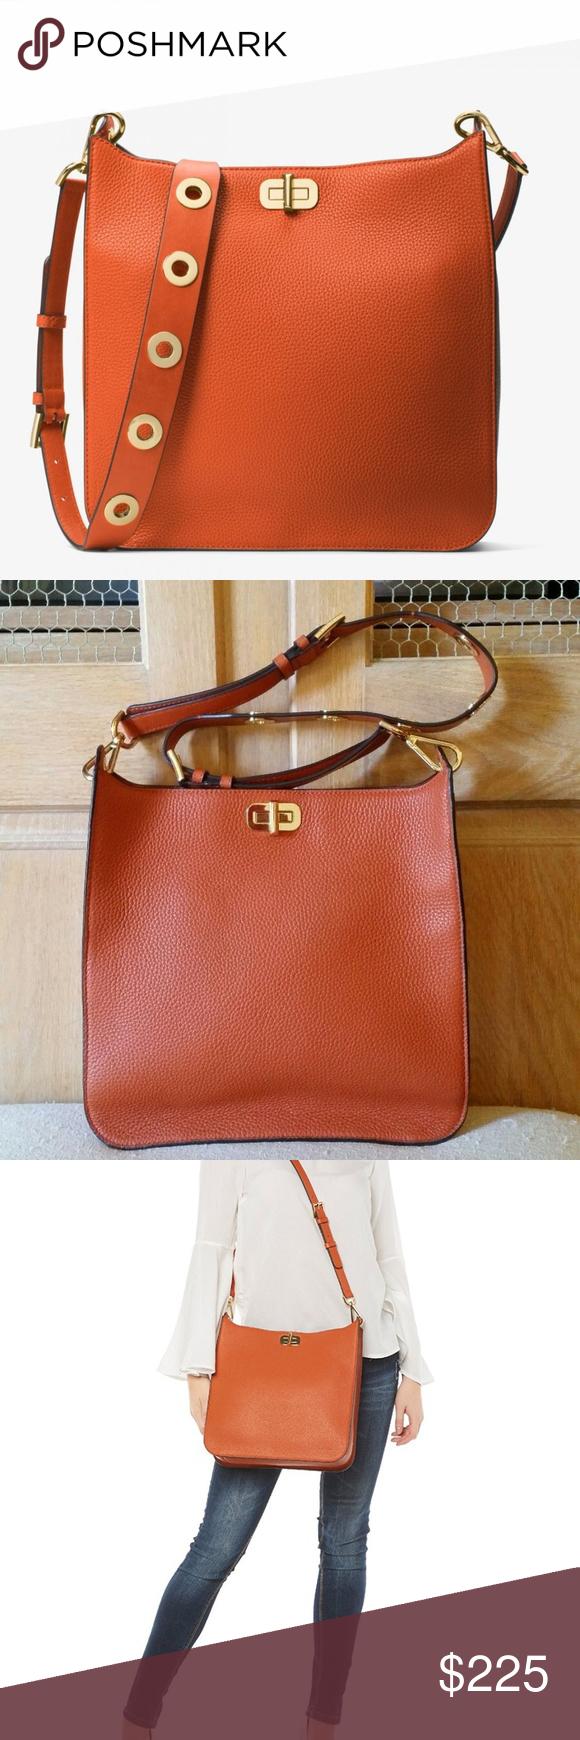 50bbee254363 Spotted while shopping on Poshmark  MICHAEL KORS Sullivan Large Messenger  Bag Orange!  poshmark  fashion  shopping  style  MICHAEL Michael Kors   Handbags